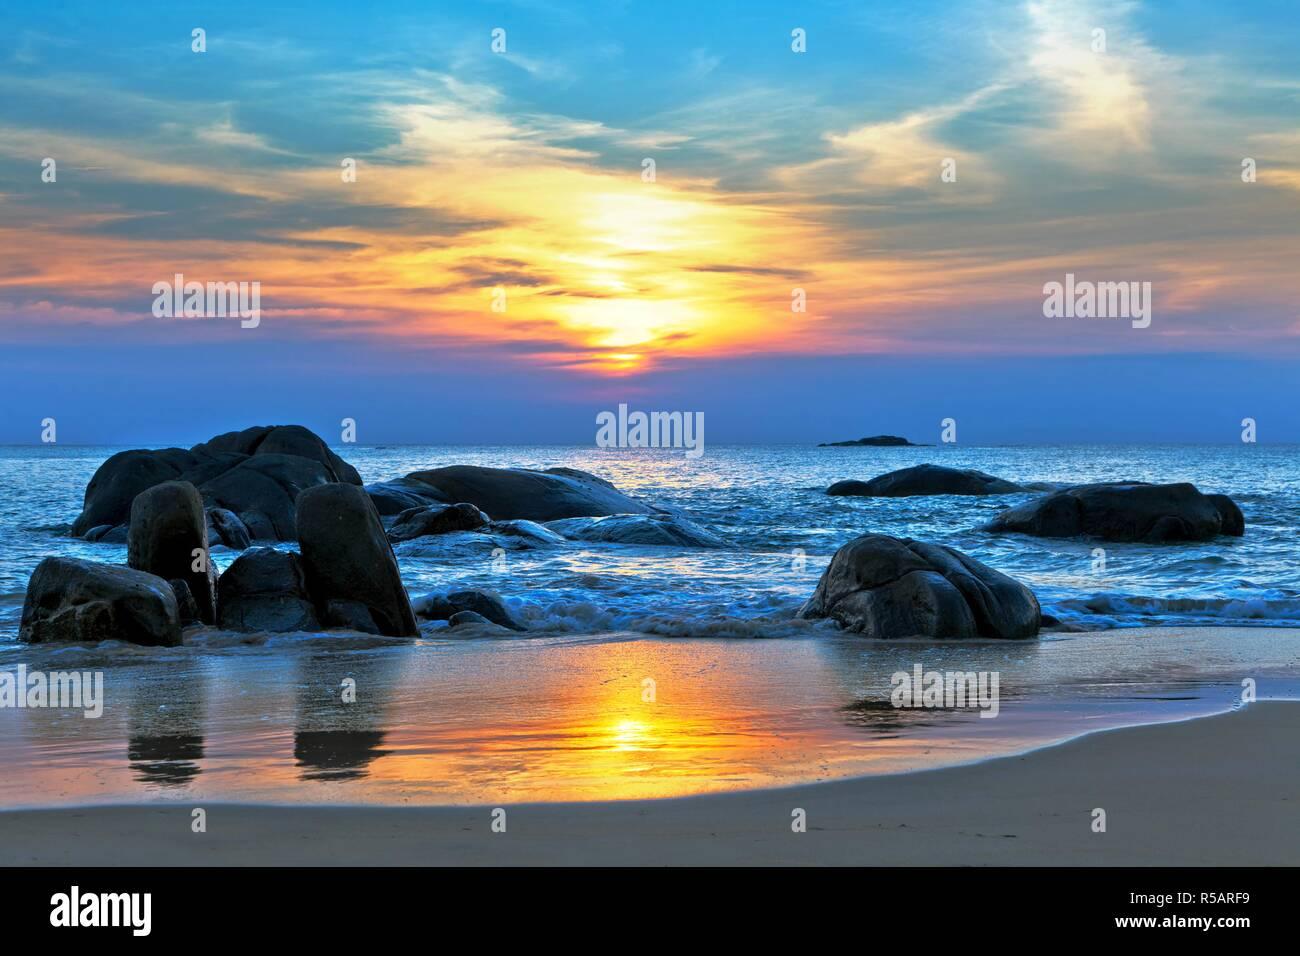 8K Sunset Photo in Hawaii - Stock Image